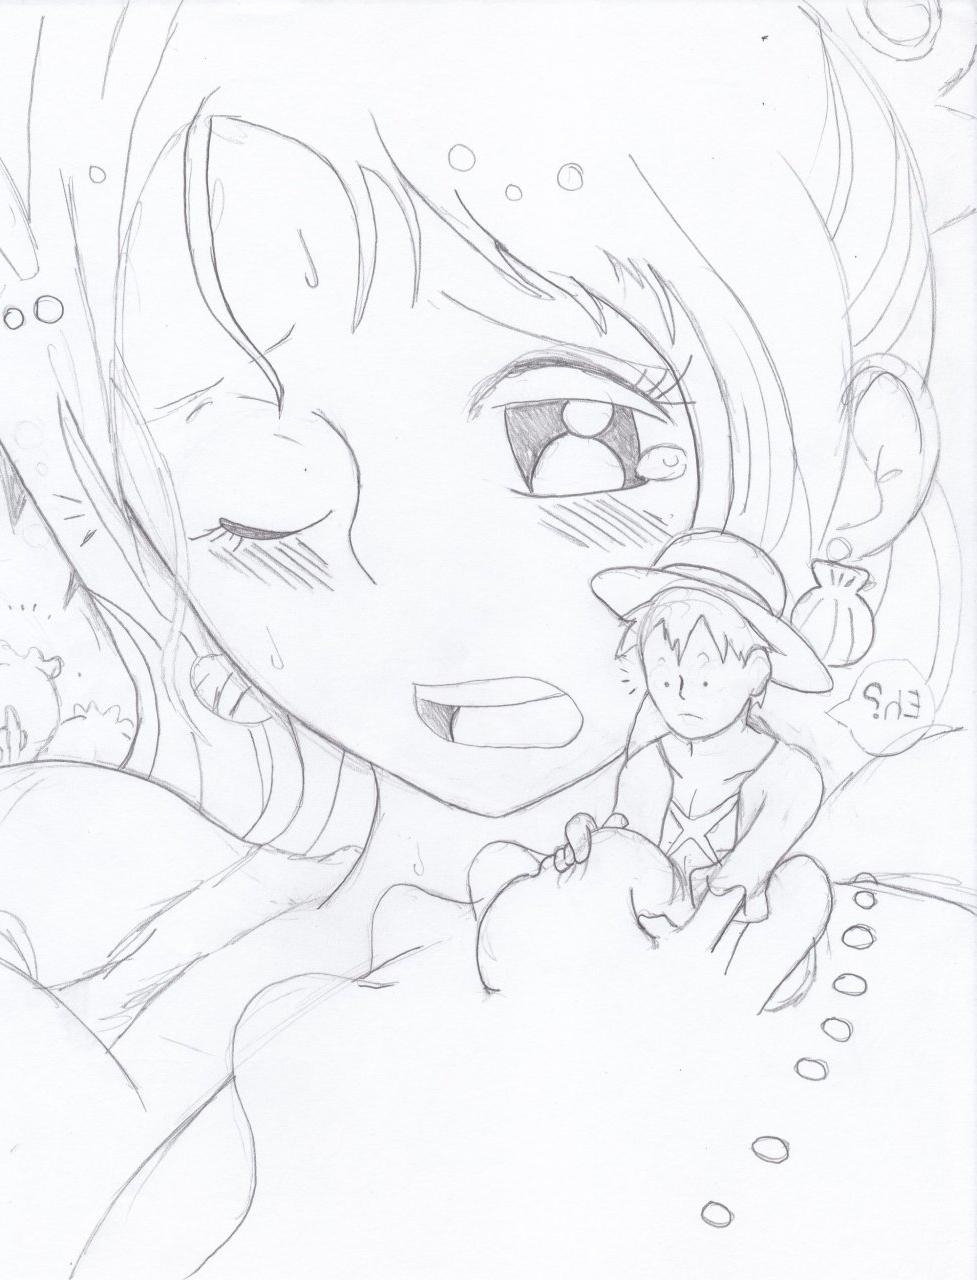 Toon sex pic ##0001301133256 female monkey d. luffy one piece poorly drawn shirahoshi sketch